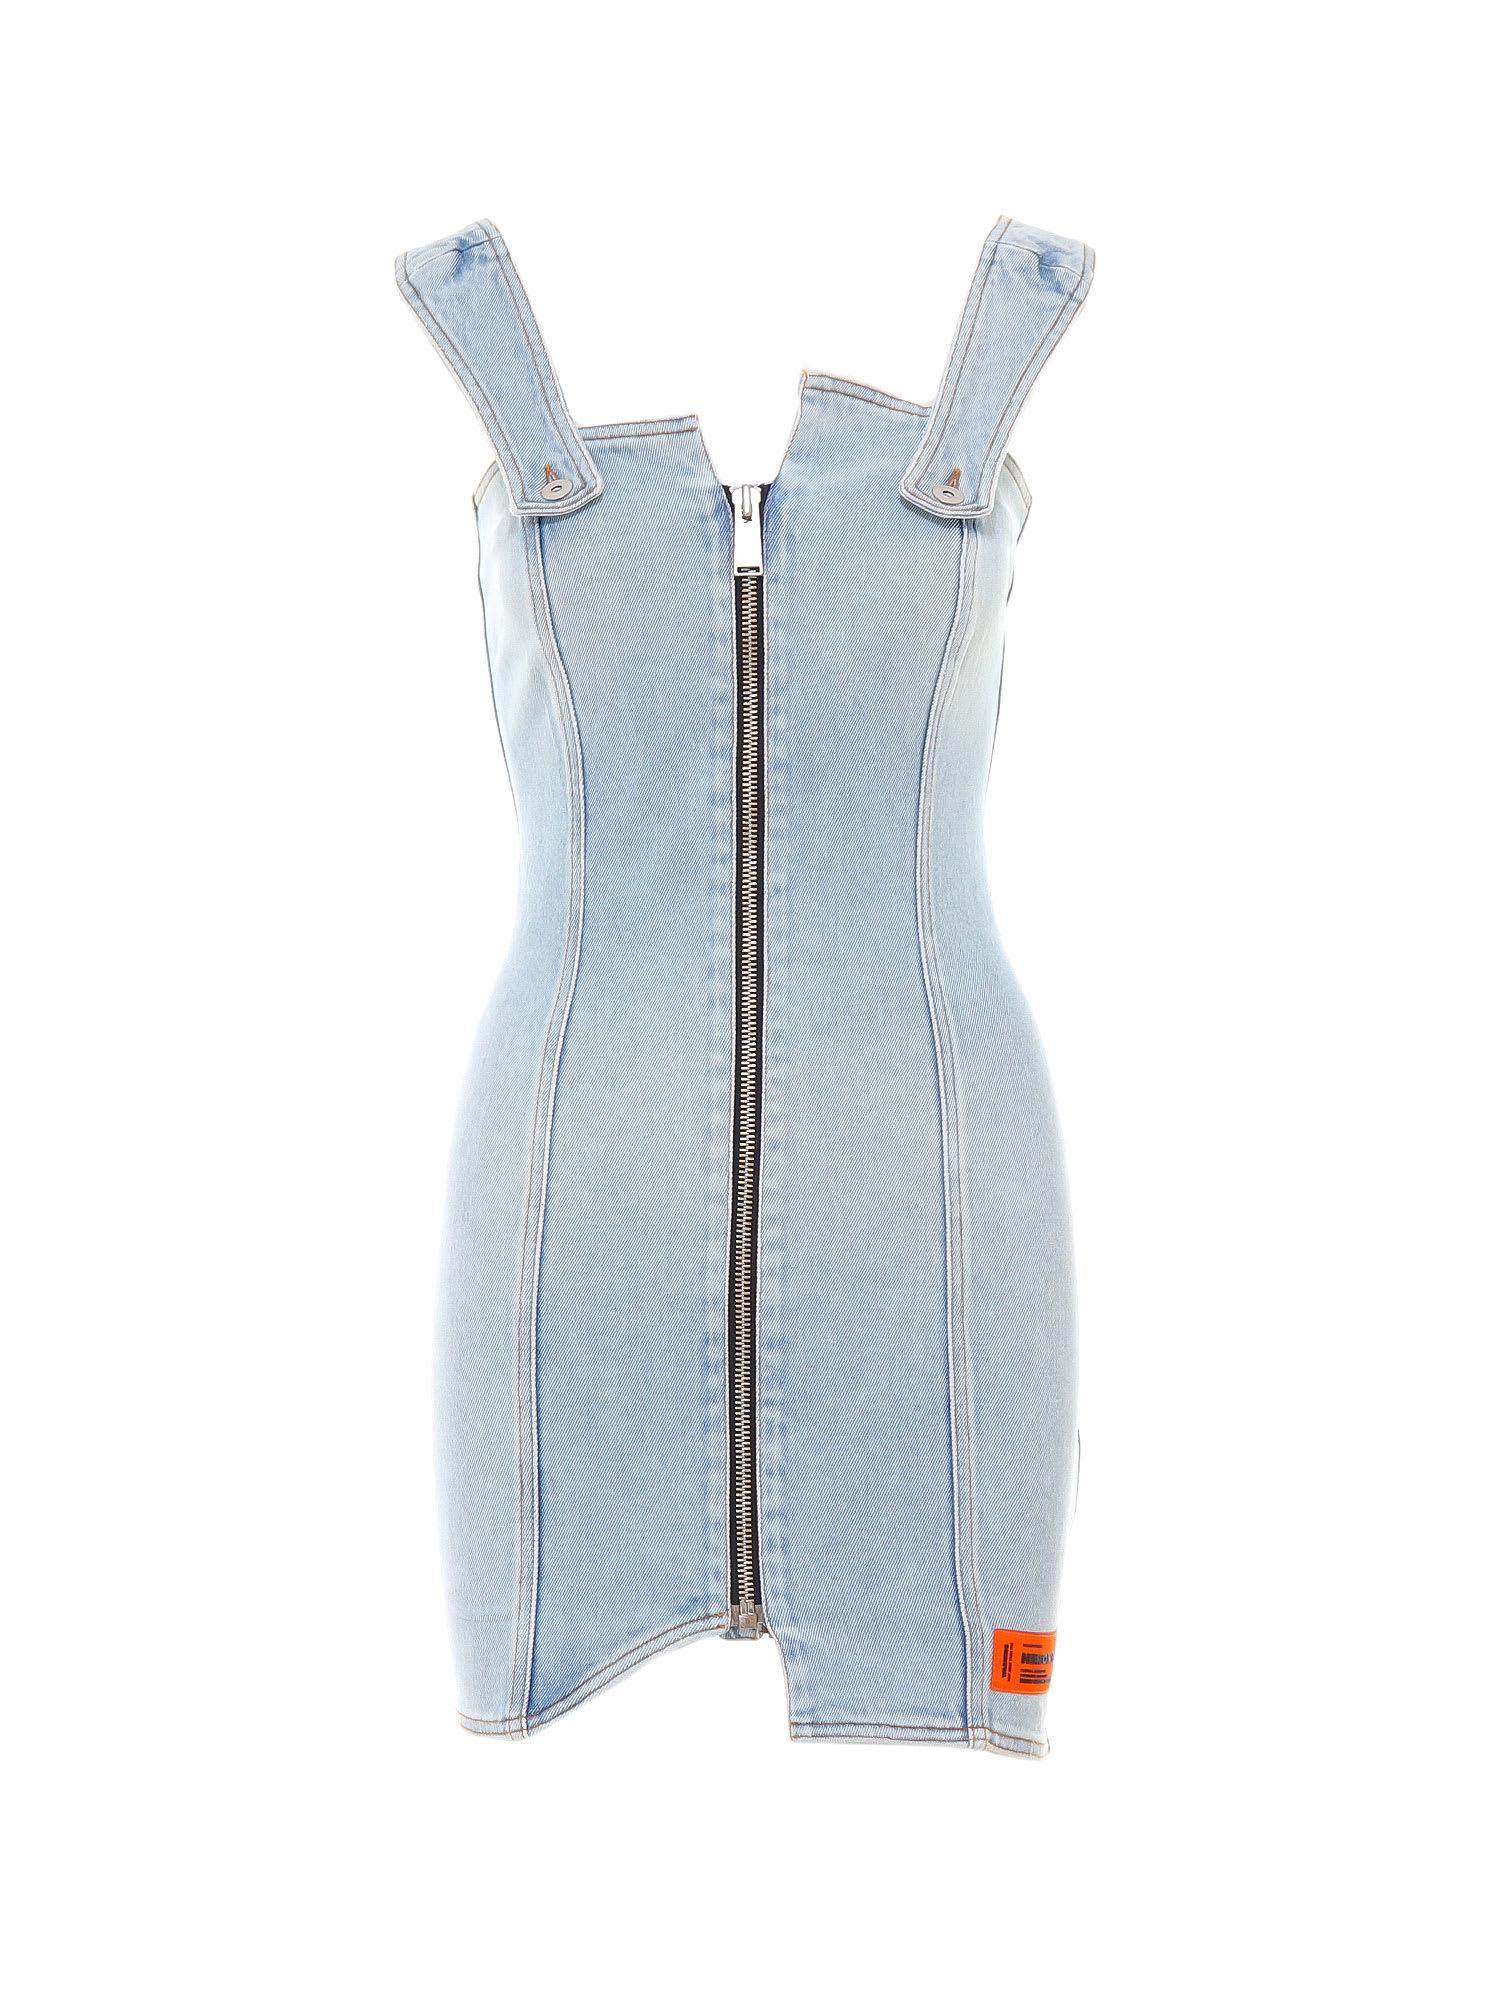 Buy HERON PRESTON Denim Zip Dress online, shop HERON PRESTON with free shipping